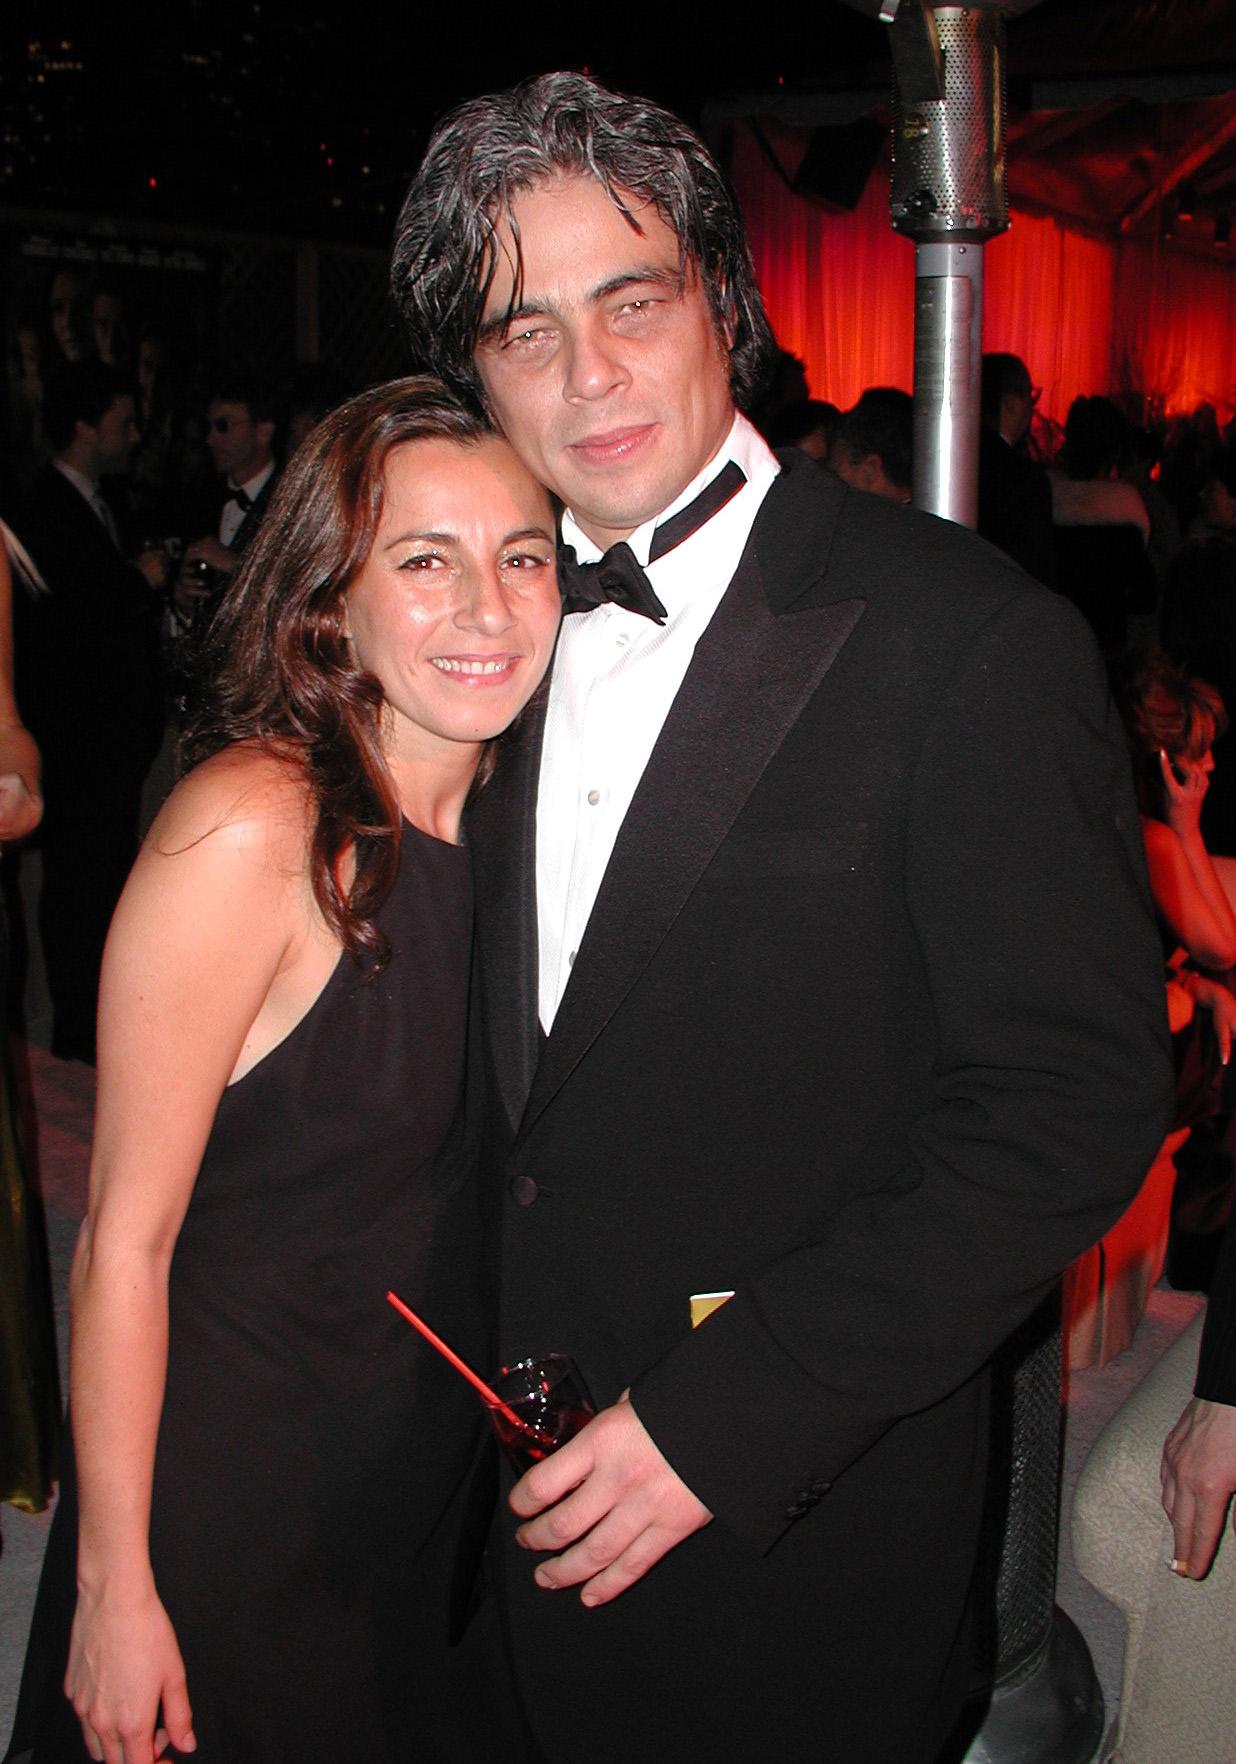 Benicio Del Toro_Selma Fonseca.JPG